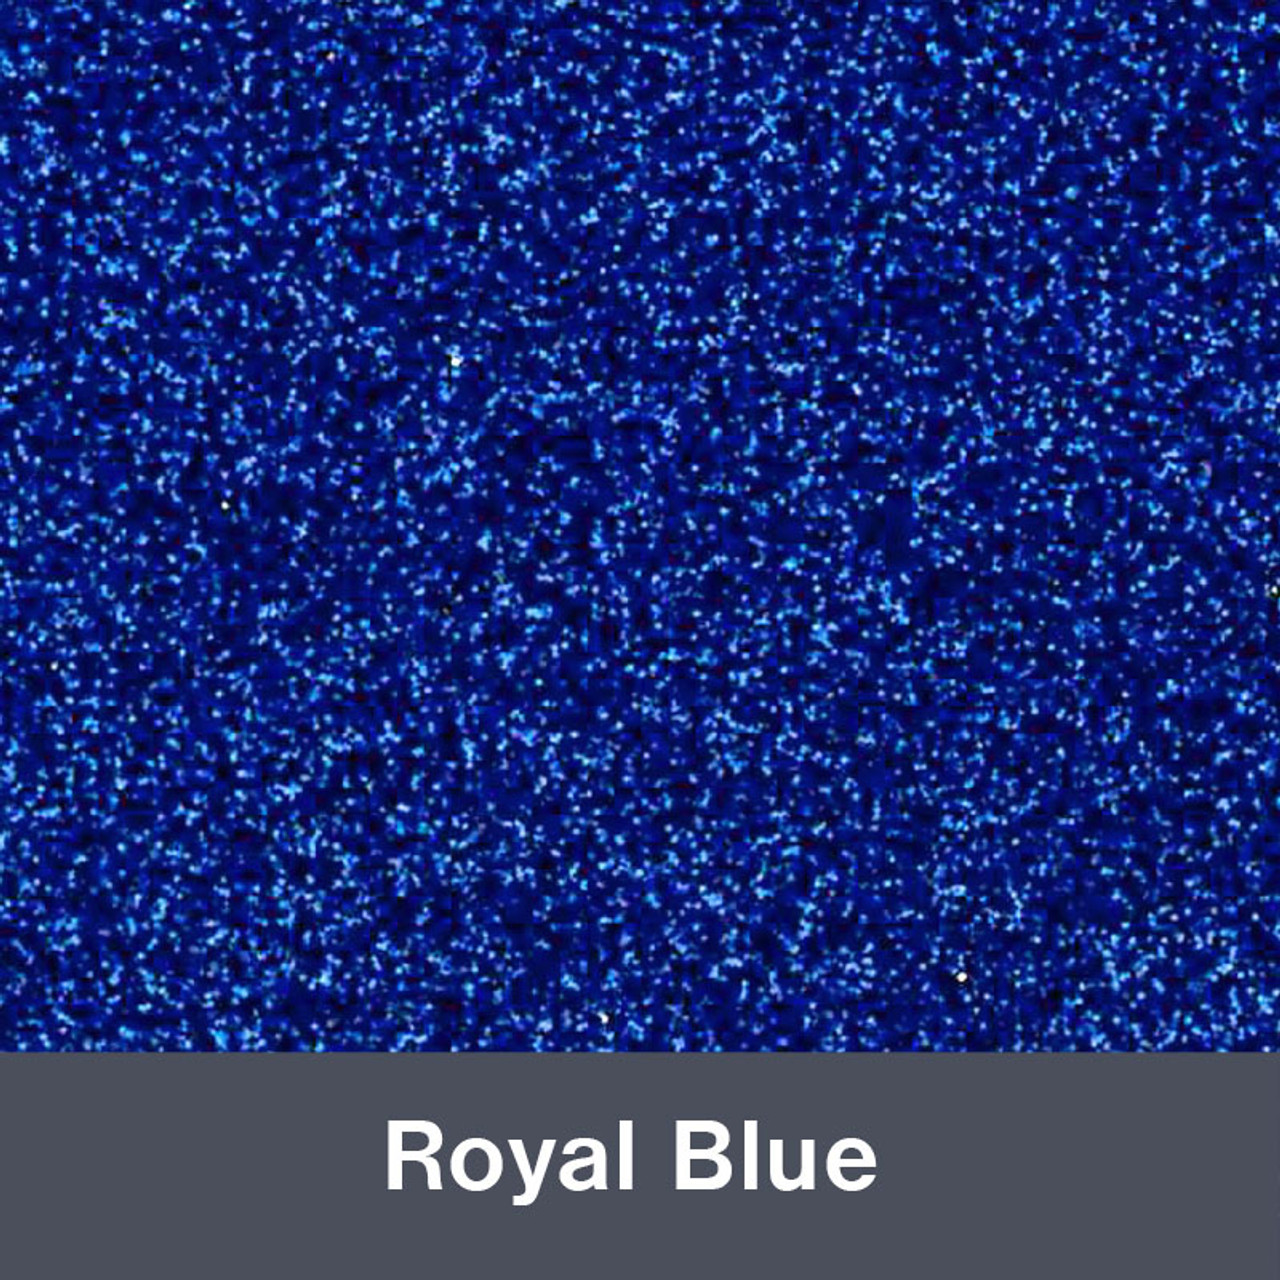 "HTV Royal Blue Glitter (489) 19.75"" x 12"""